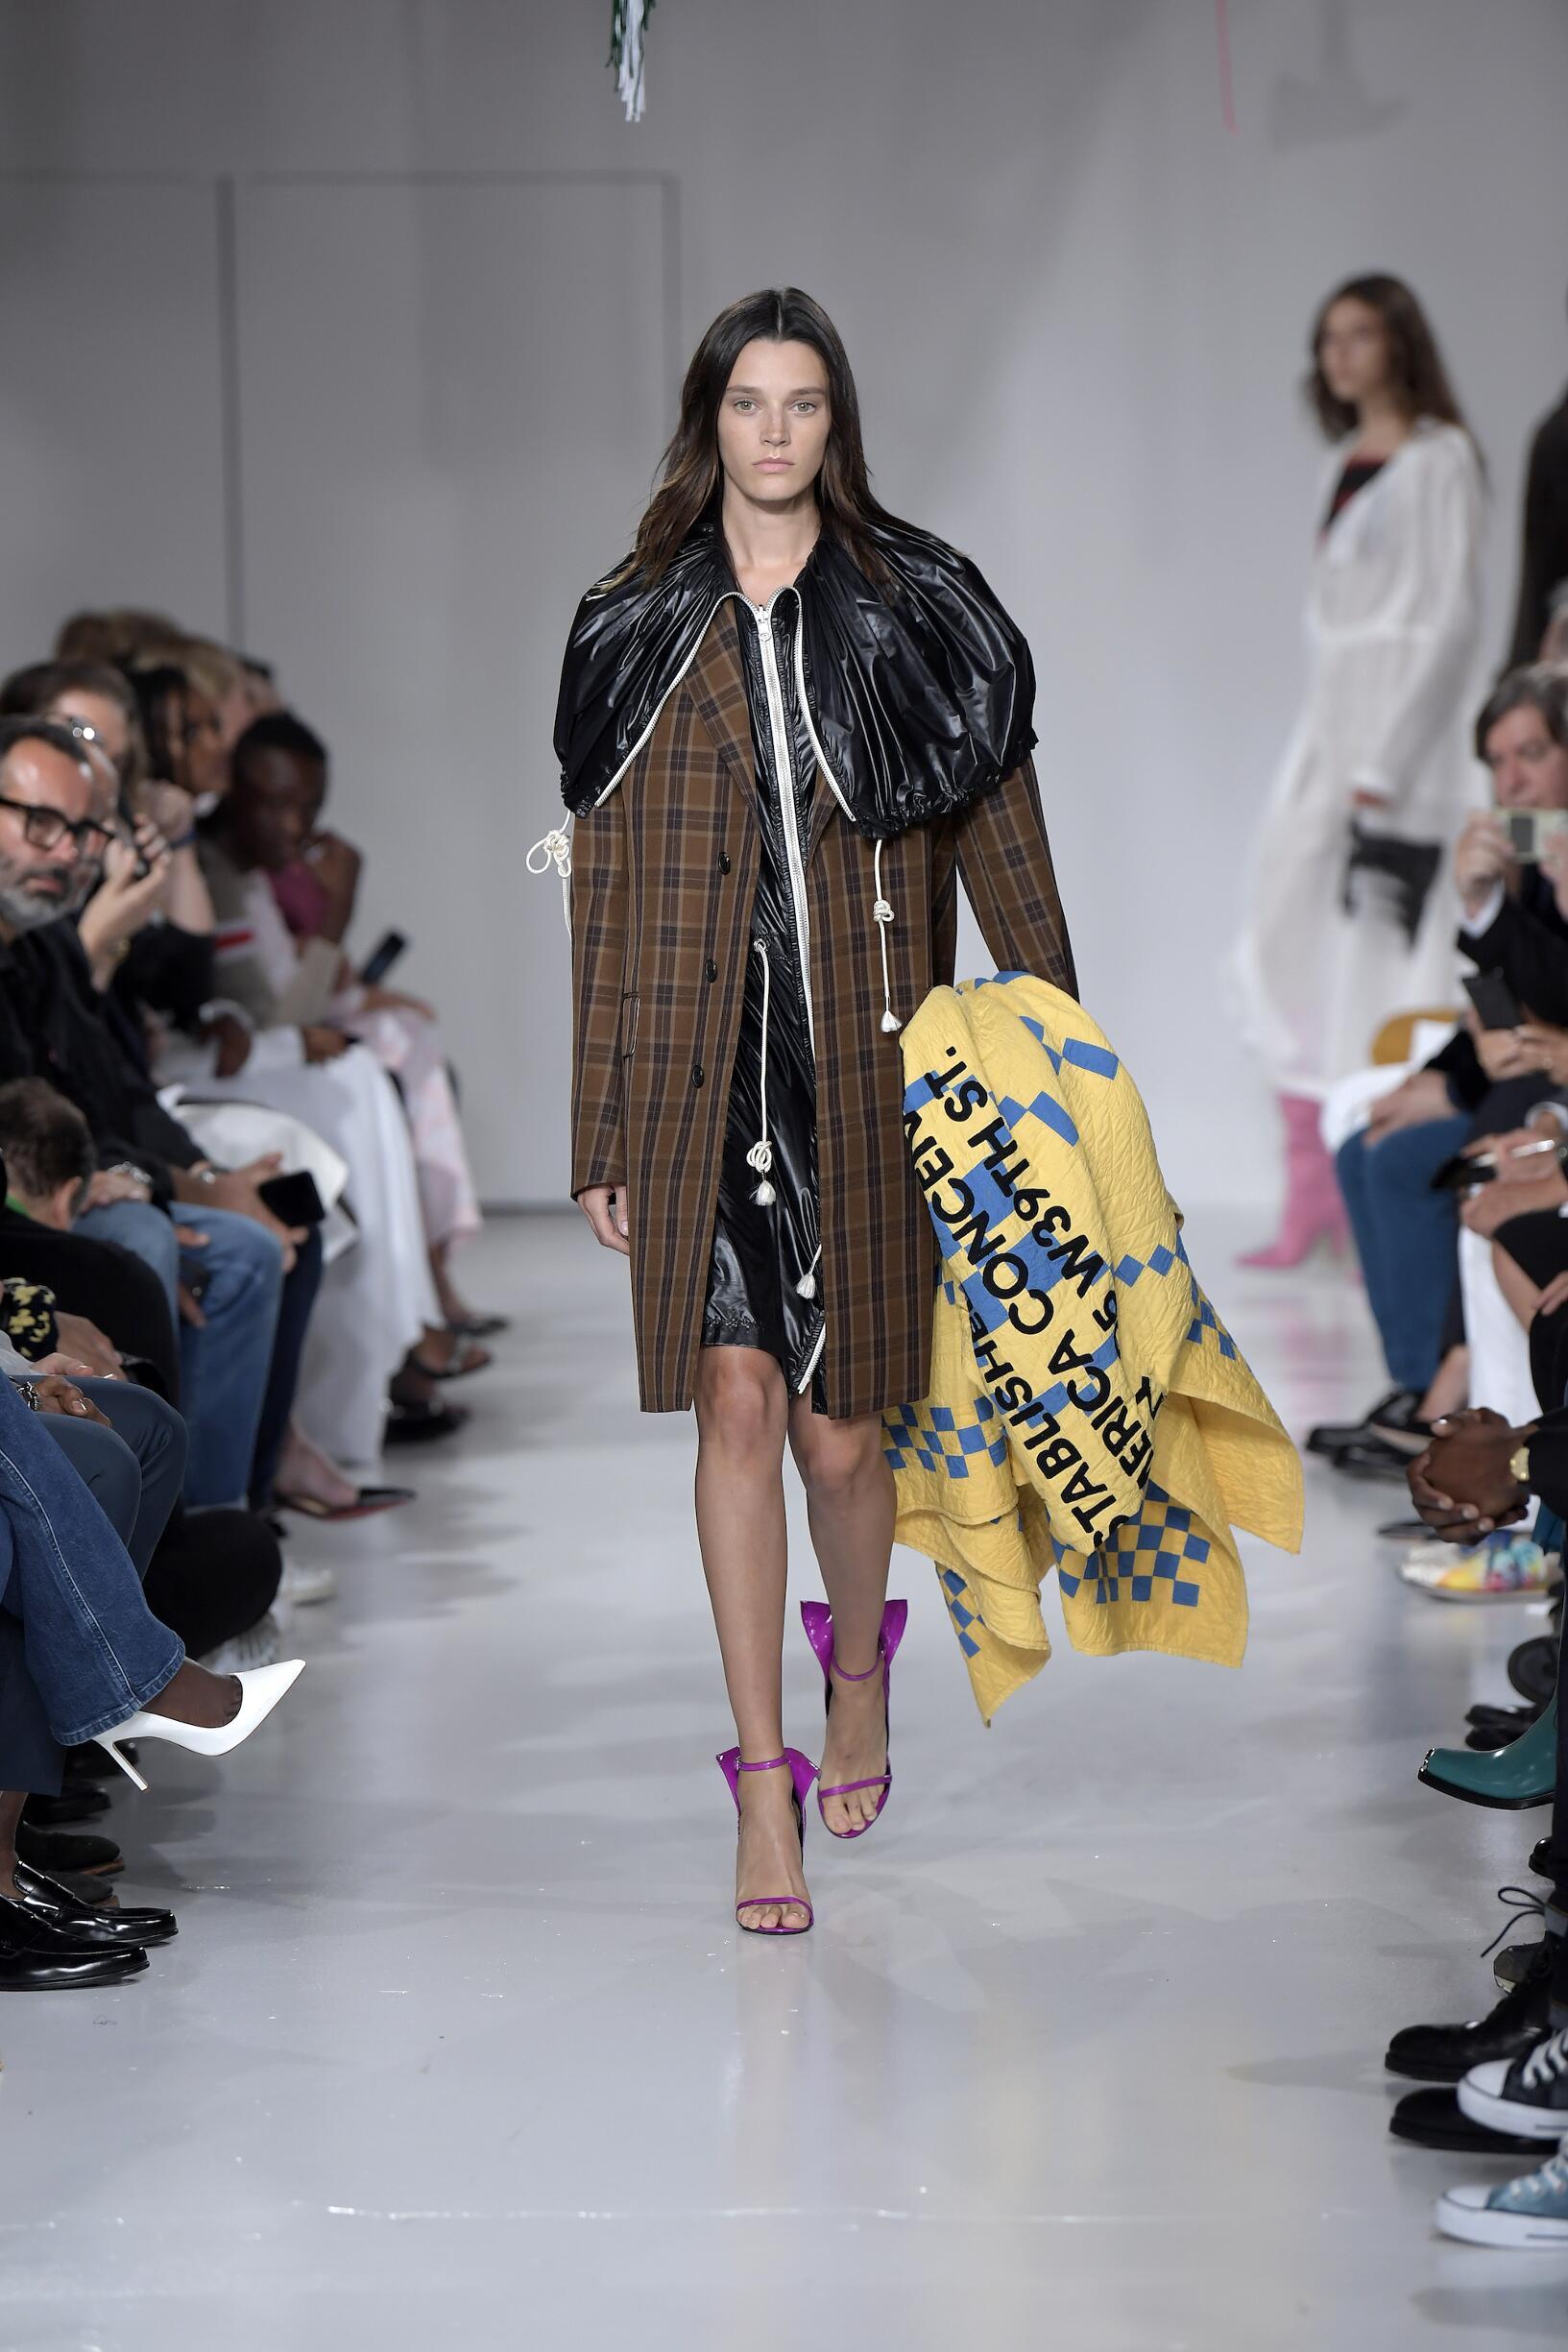 Summer 2018 Woman Trends Calvin Klein 205W39NYC